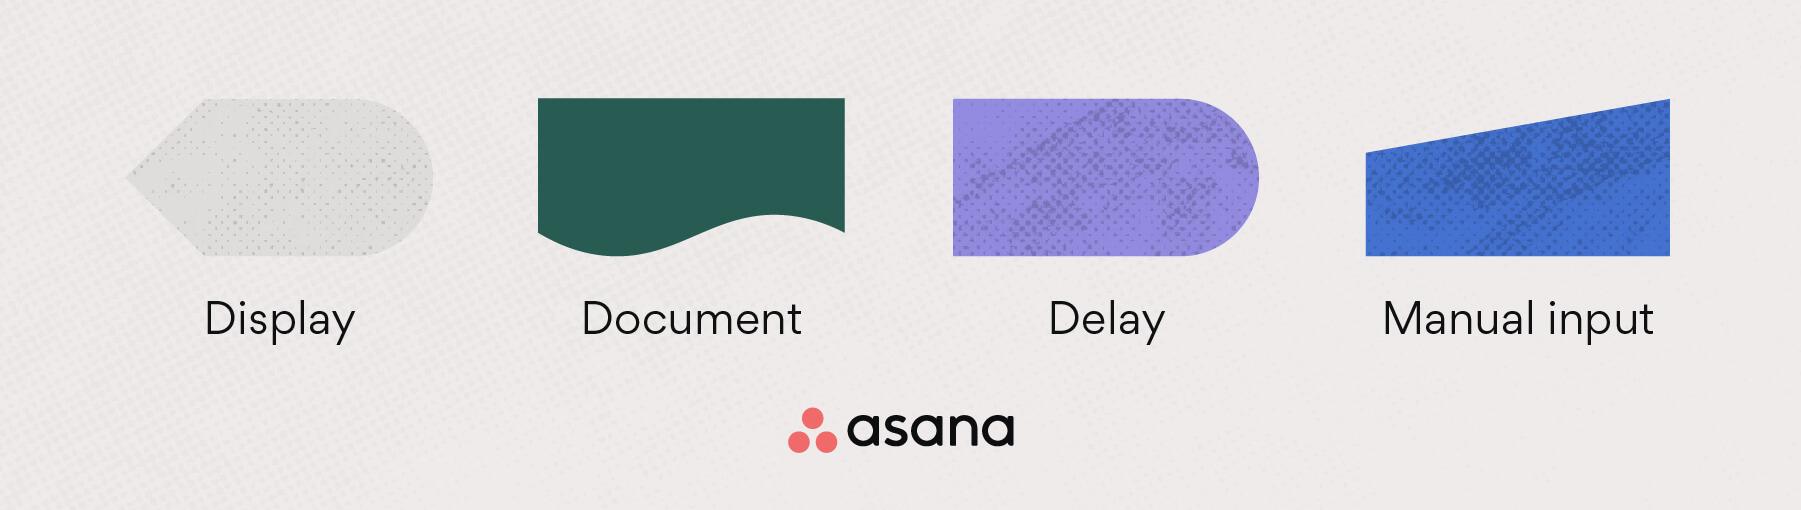 Flowchart symbols: display, document, delay + manual input